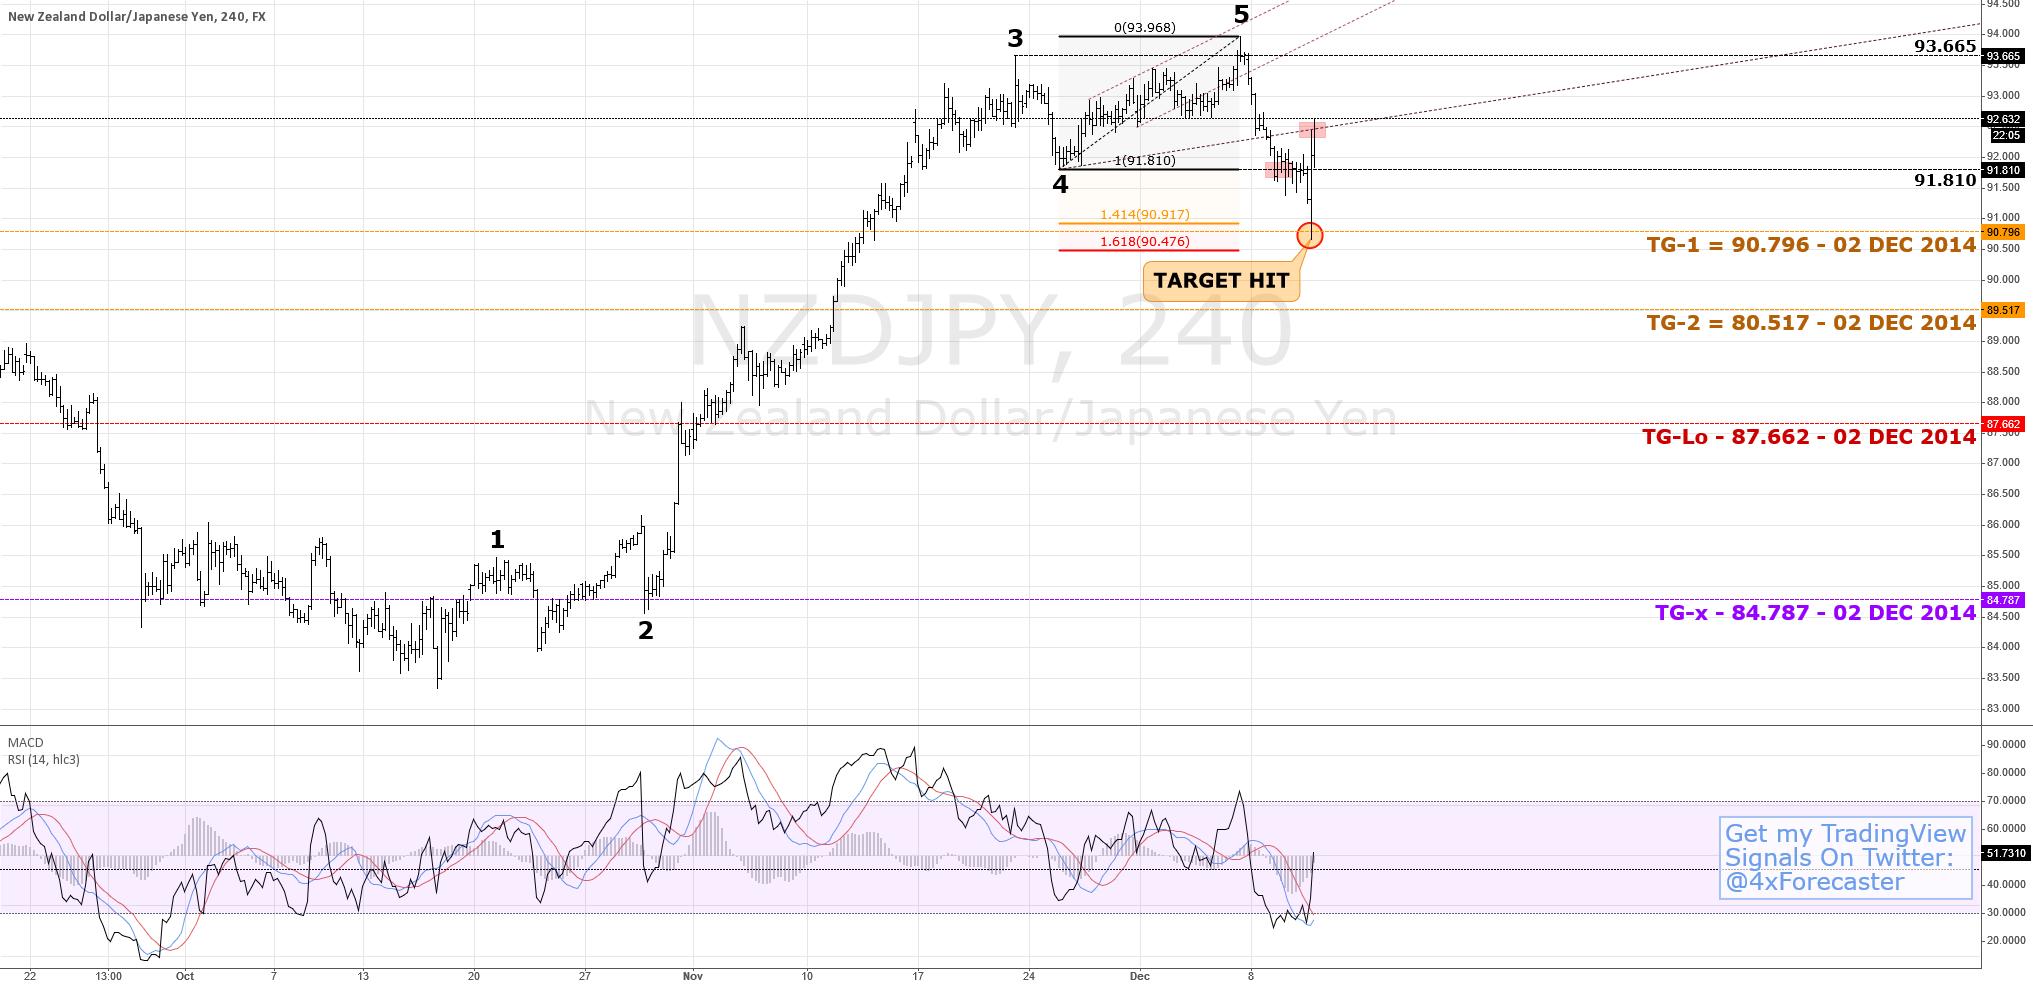 Late Entry: $NZD vs. $JPY: Predictive Analysis/Forecast #forex